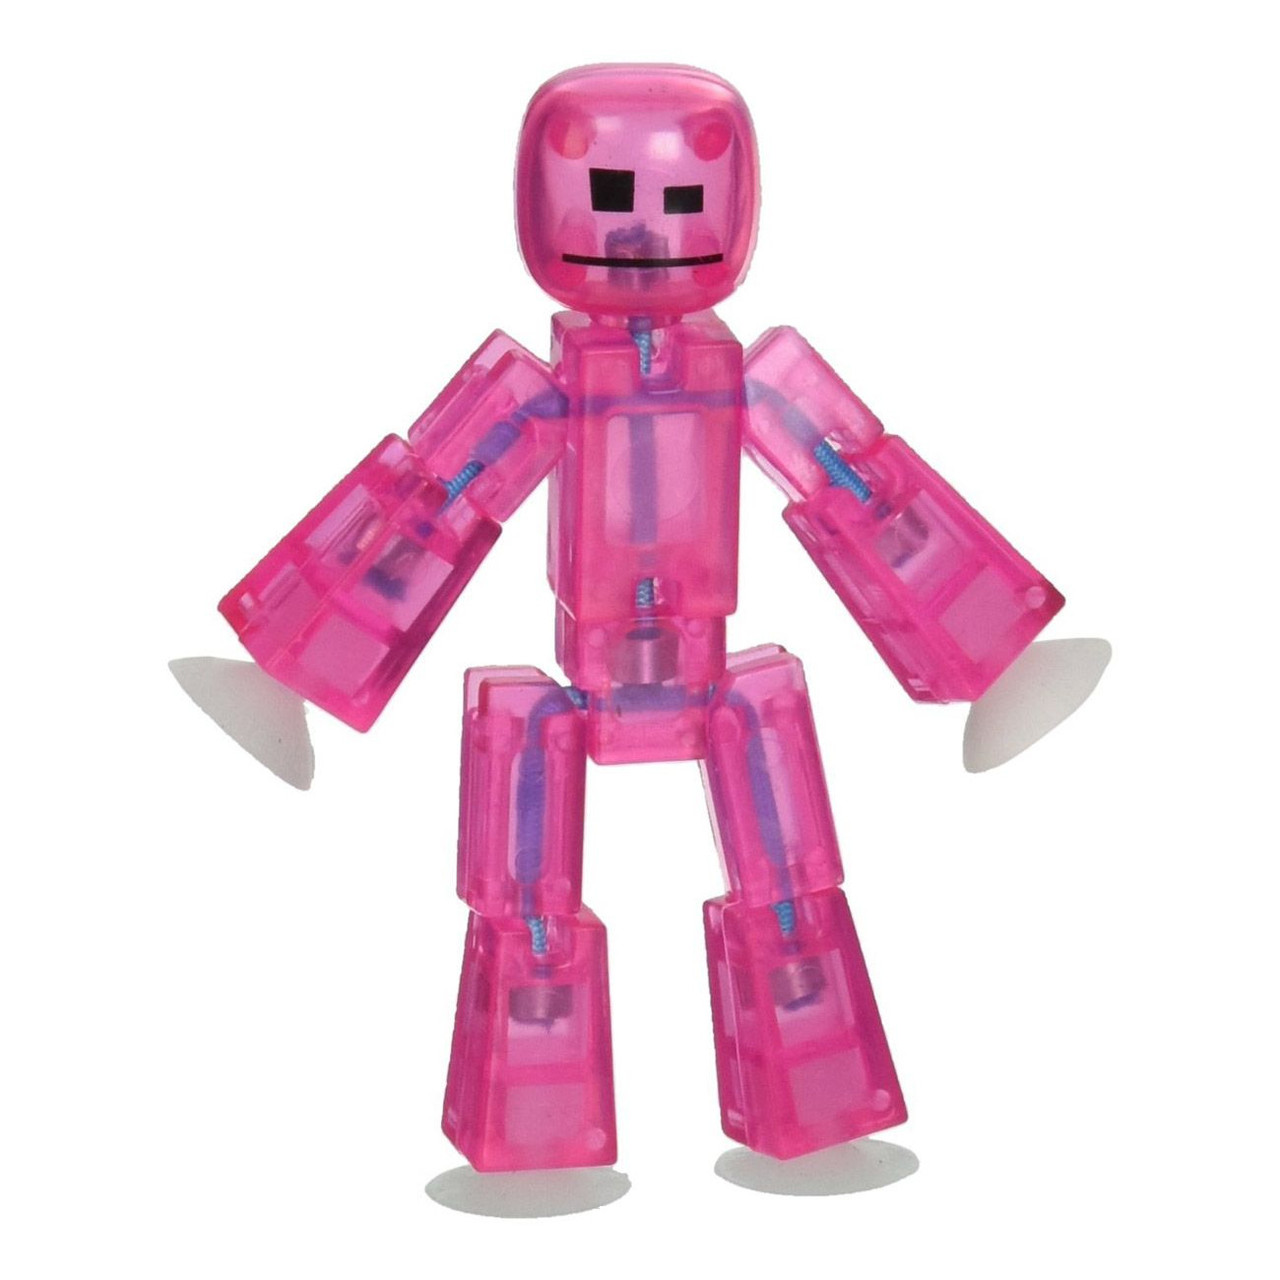 Фигурка для анимационного творчества Stikbot Розовая